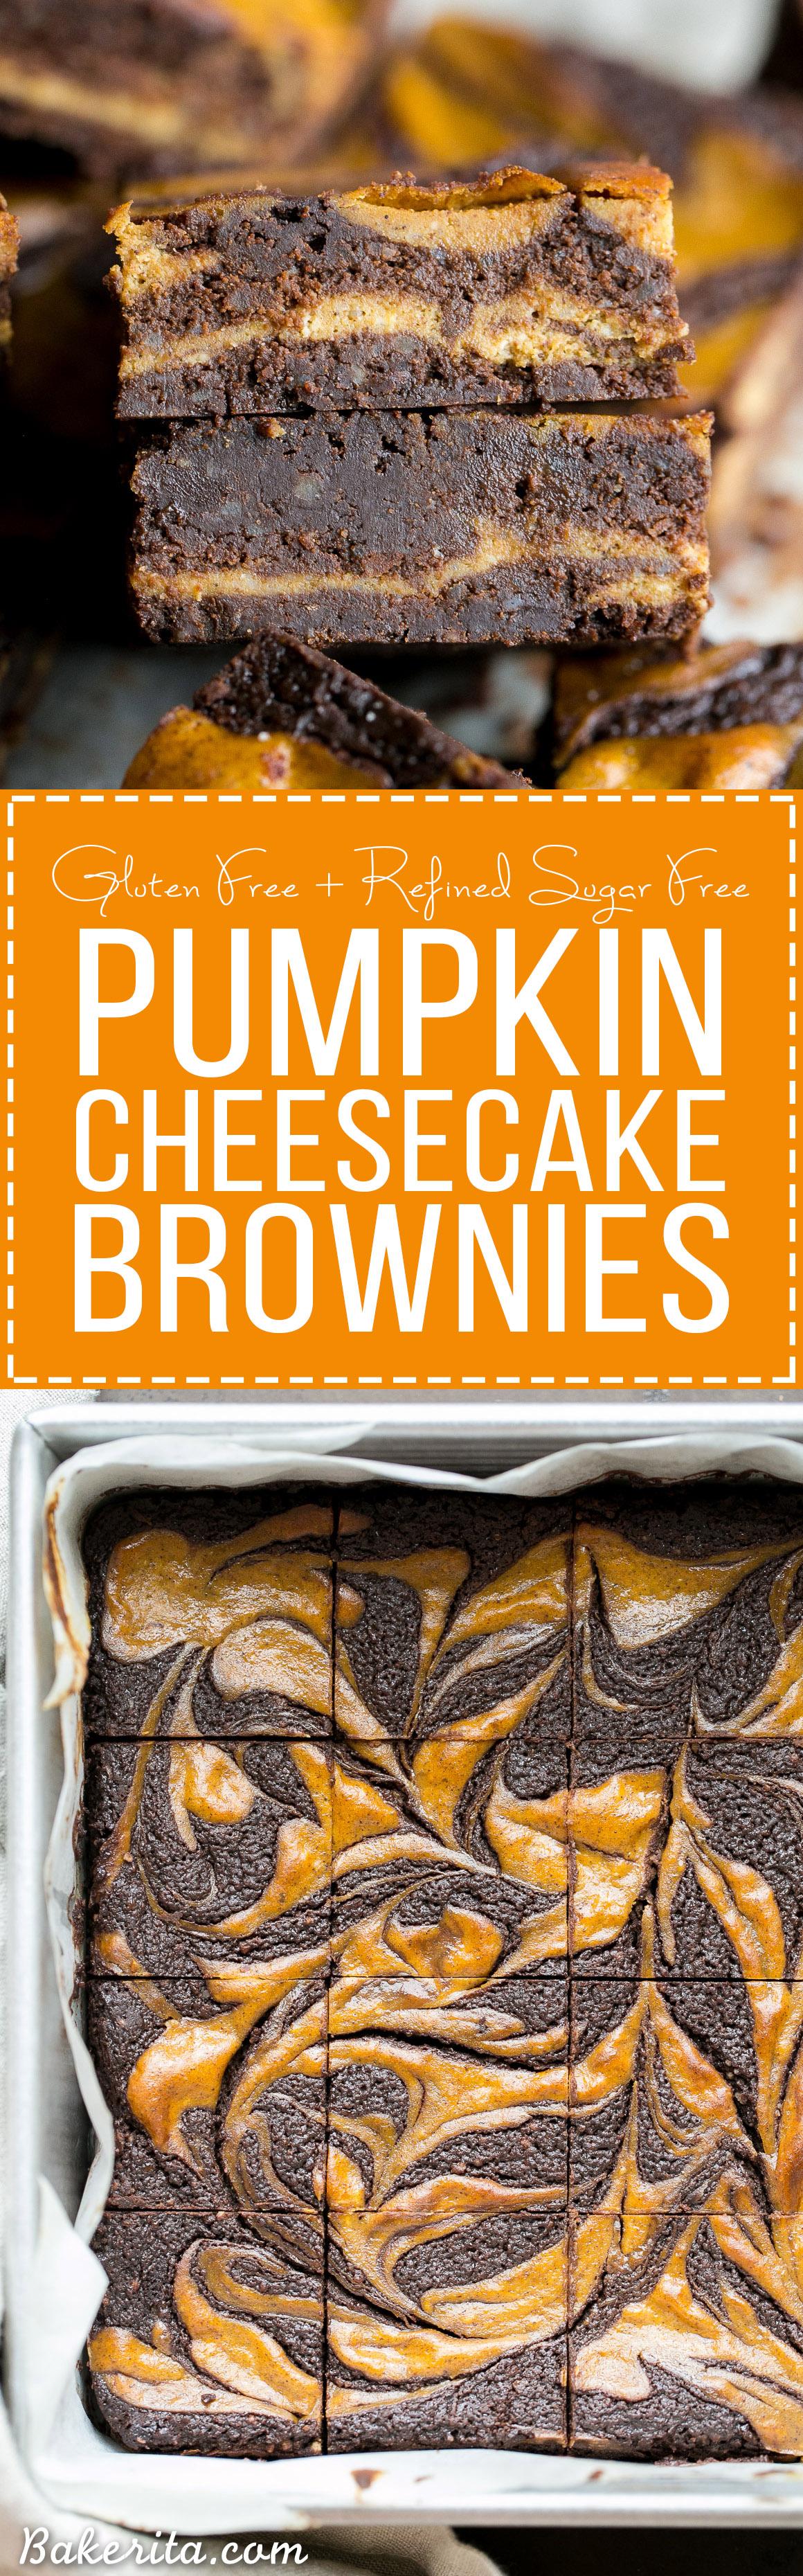 Pumpkin Cheesecake Brownies (Gluten Free + Refined Sugar Free ...